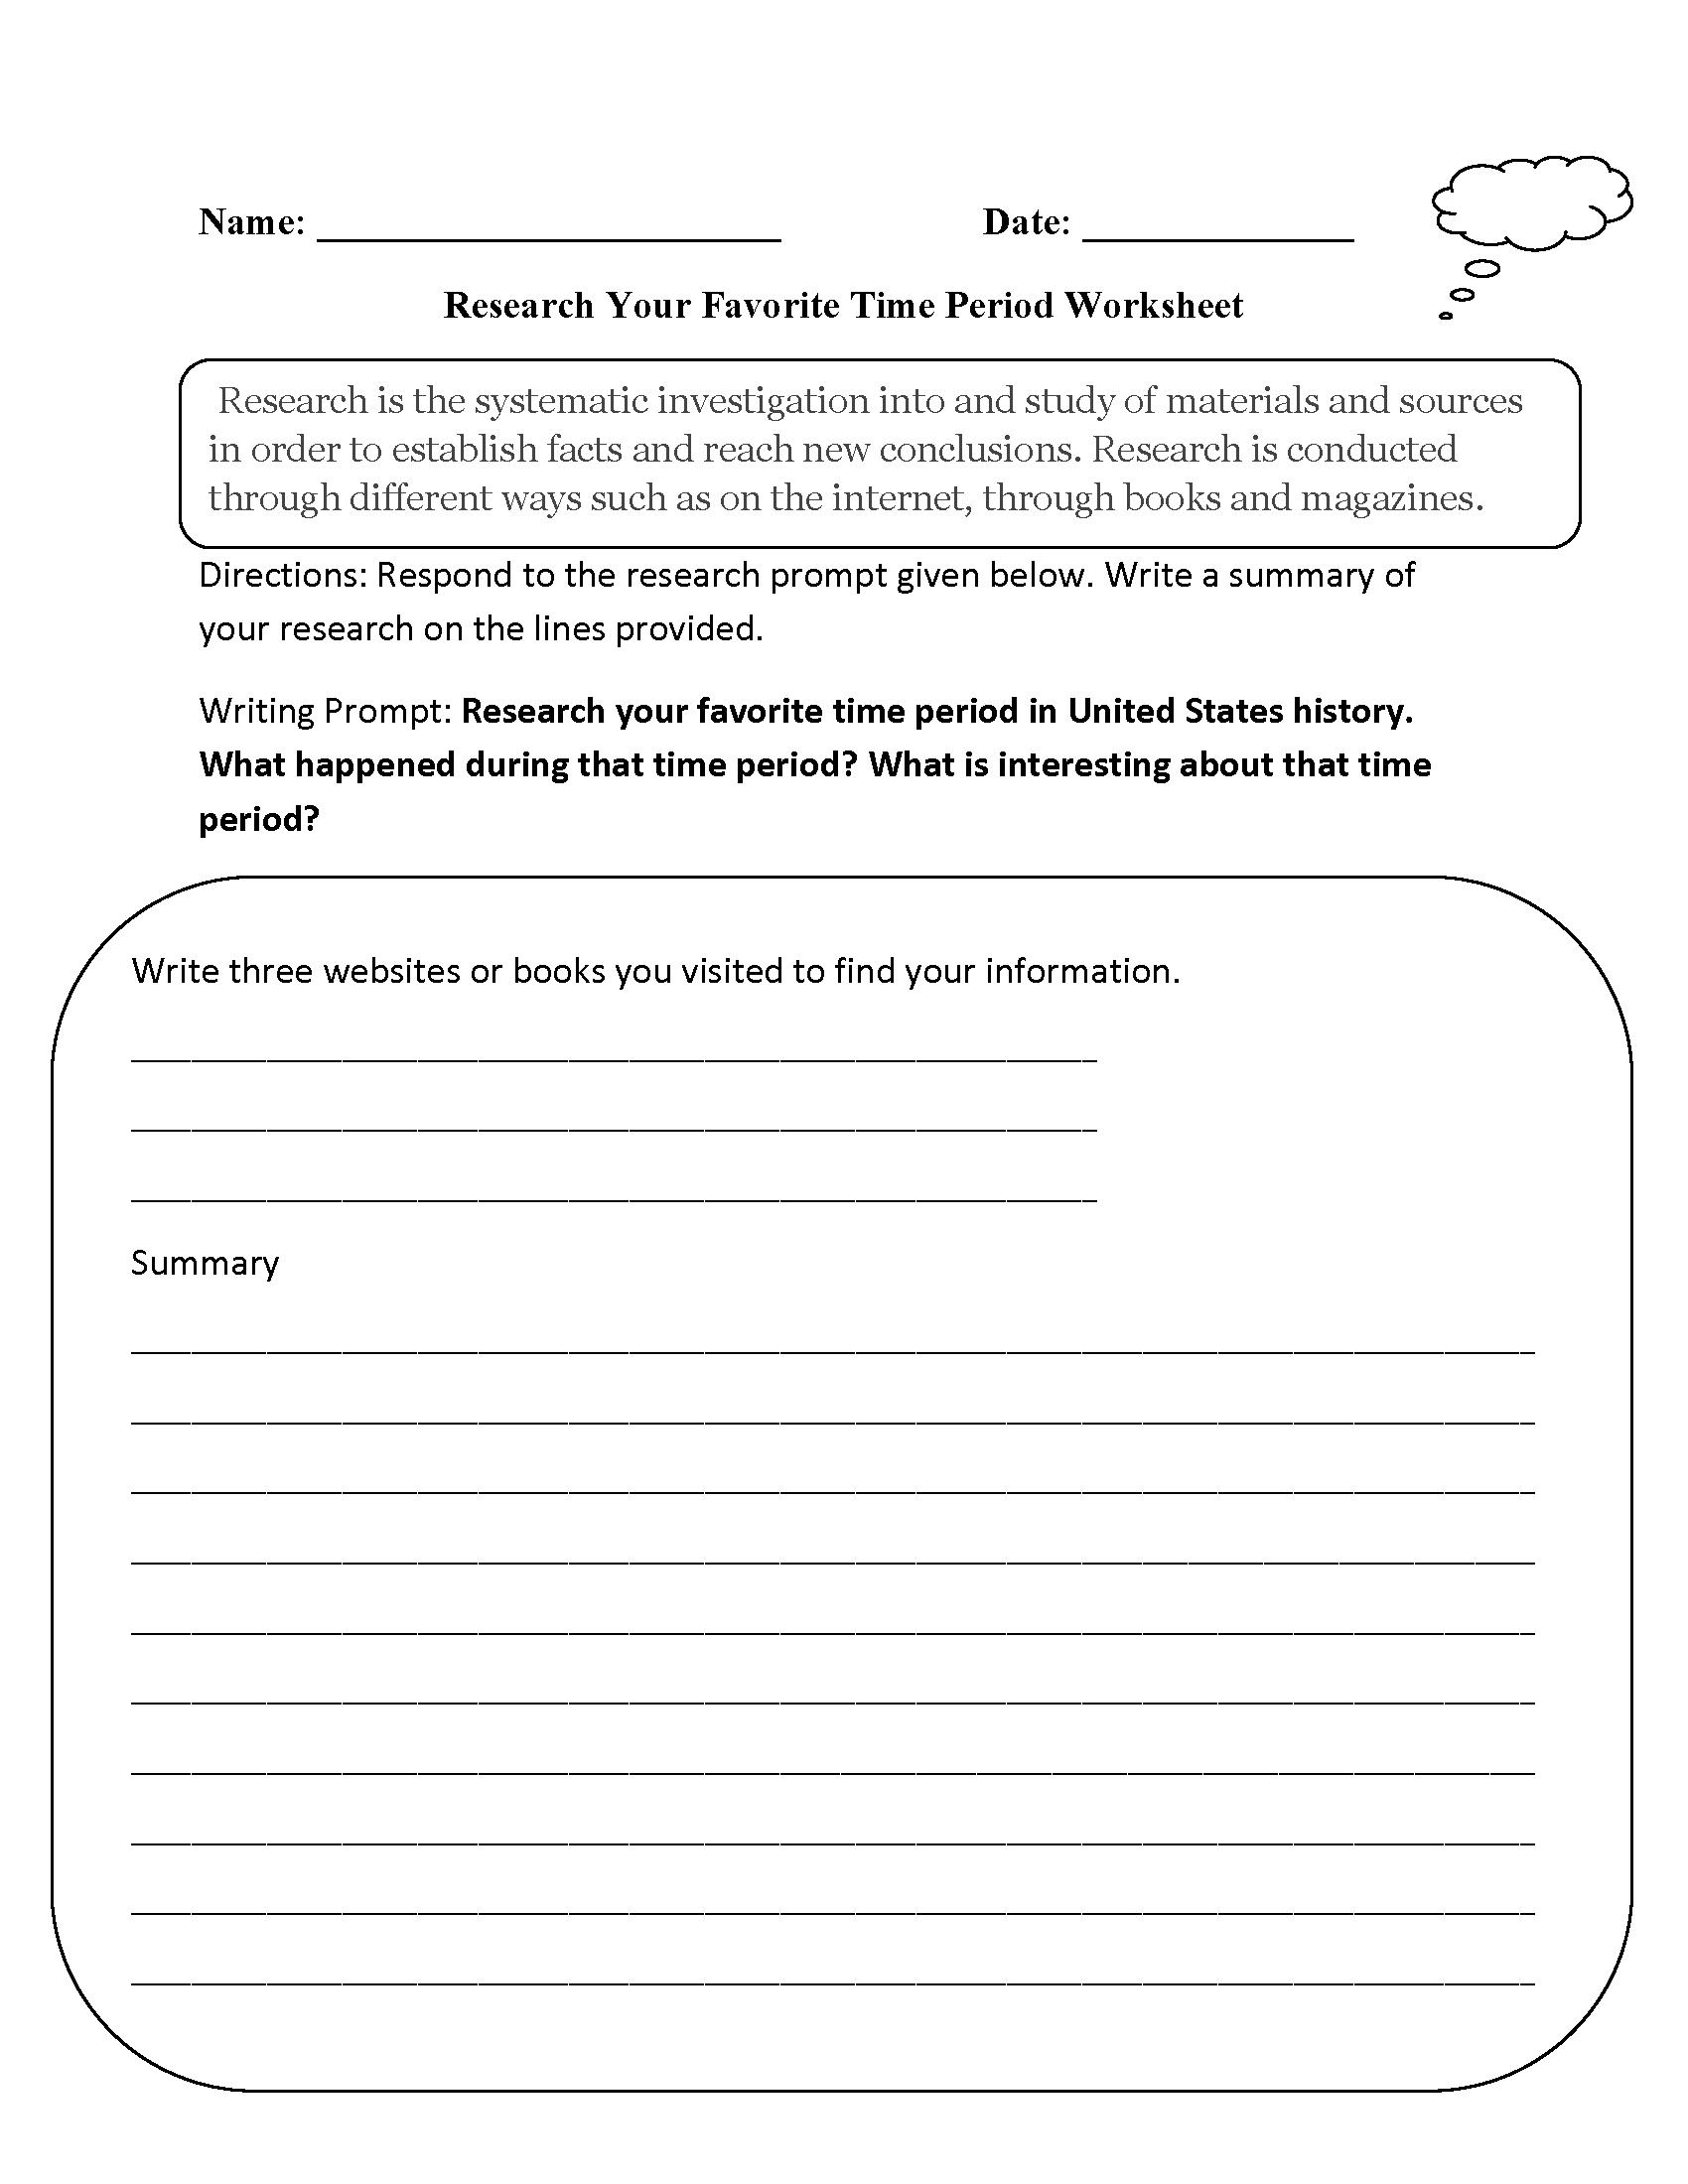 worksheet Time Study Worksheet research favorite time period worksheet lesson plans pinterest worksheet